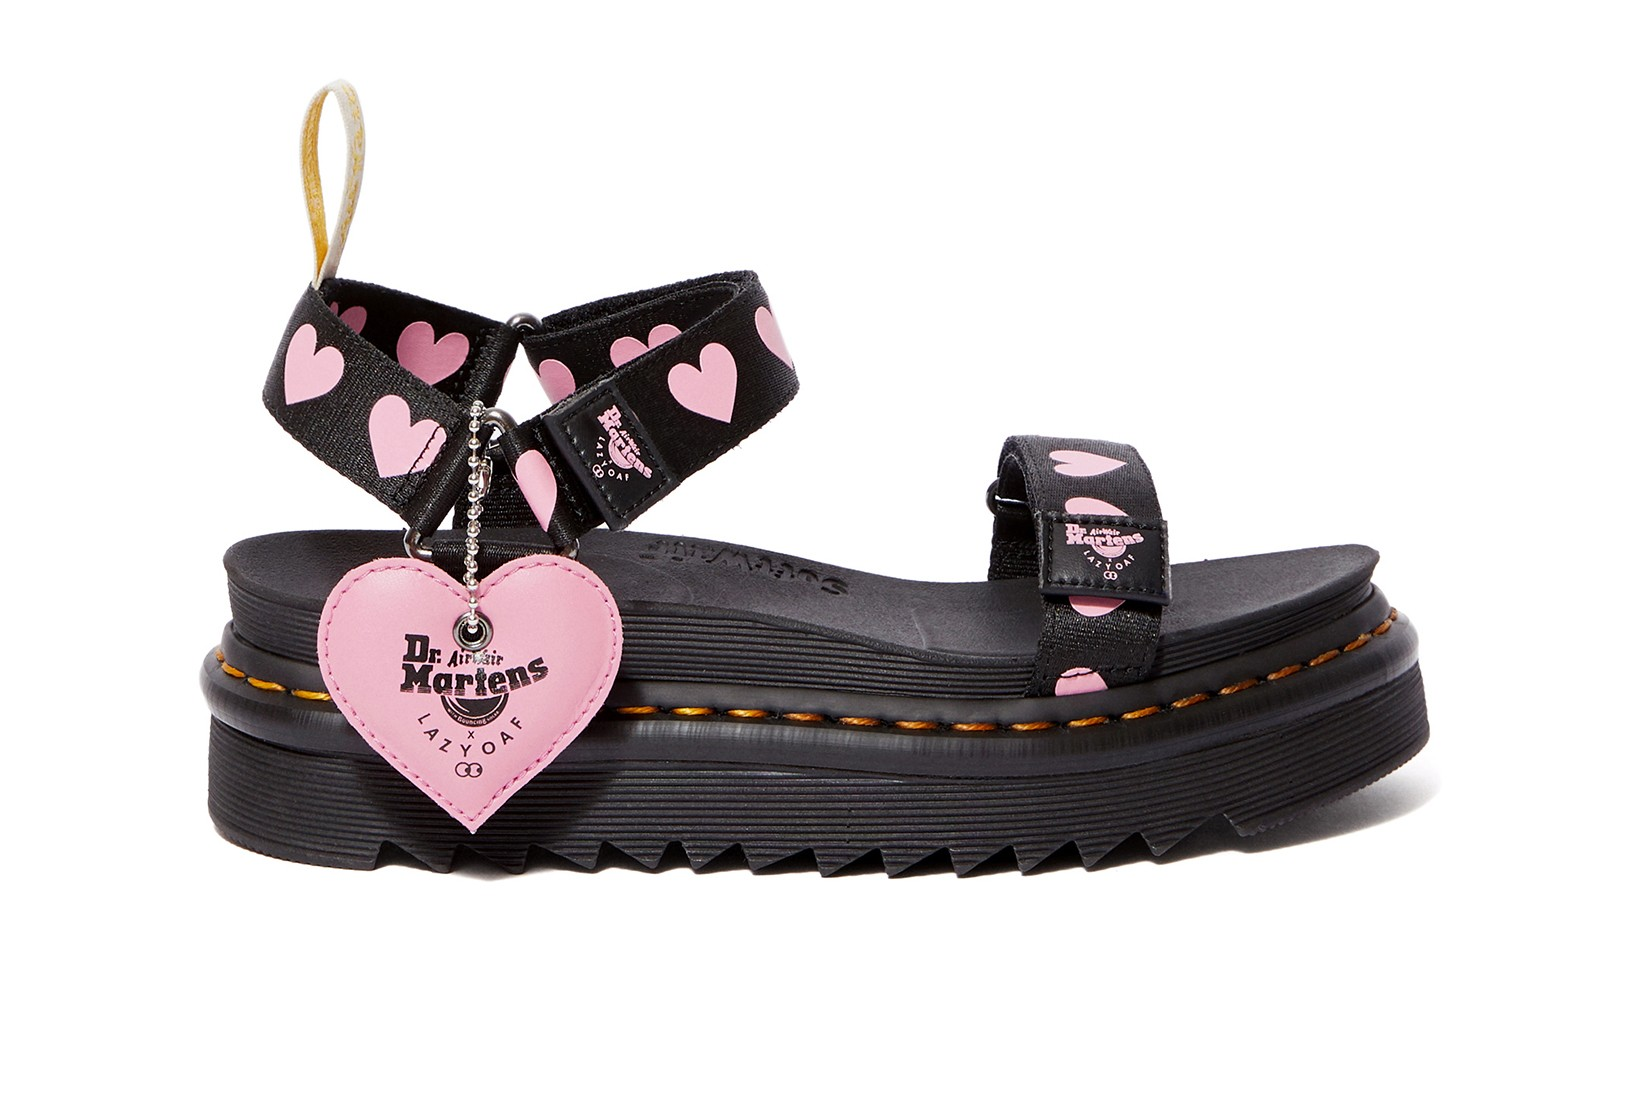 doc platform sandals